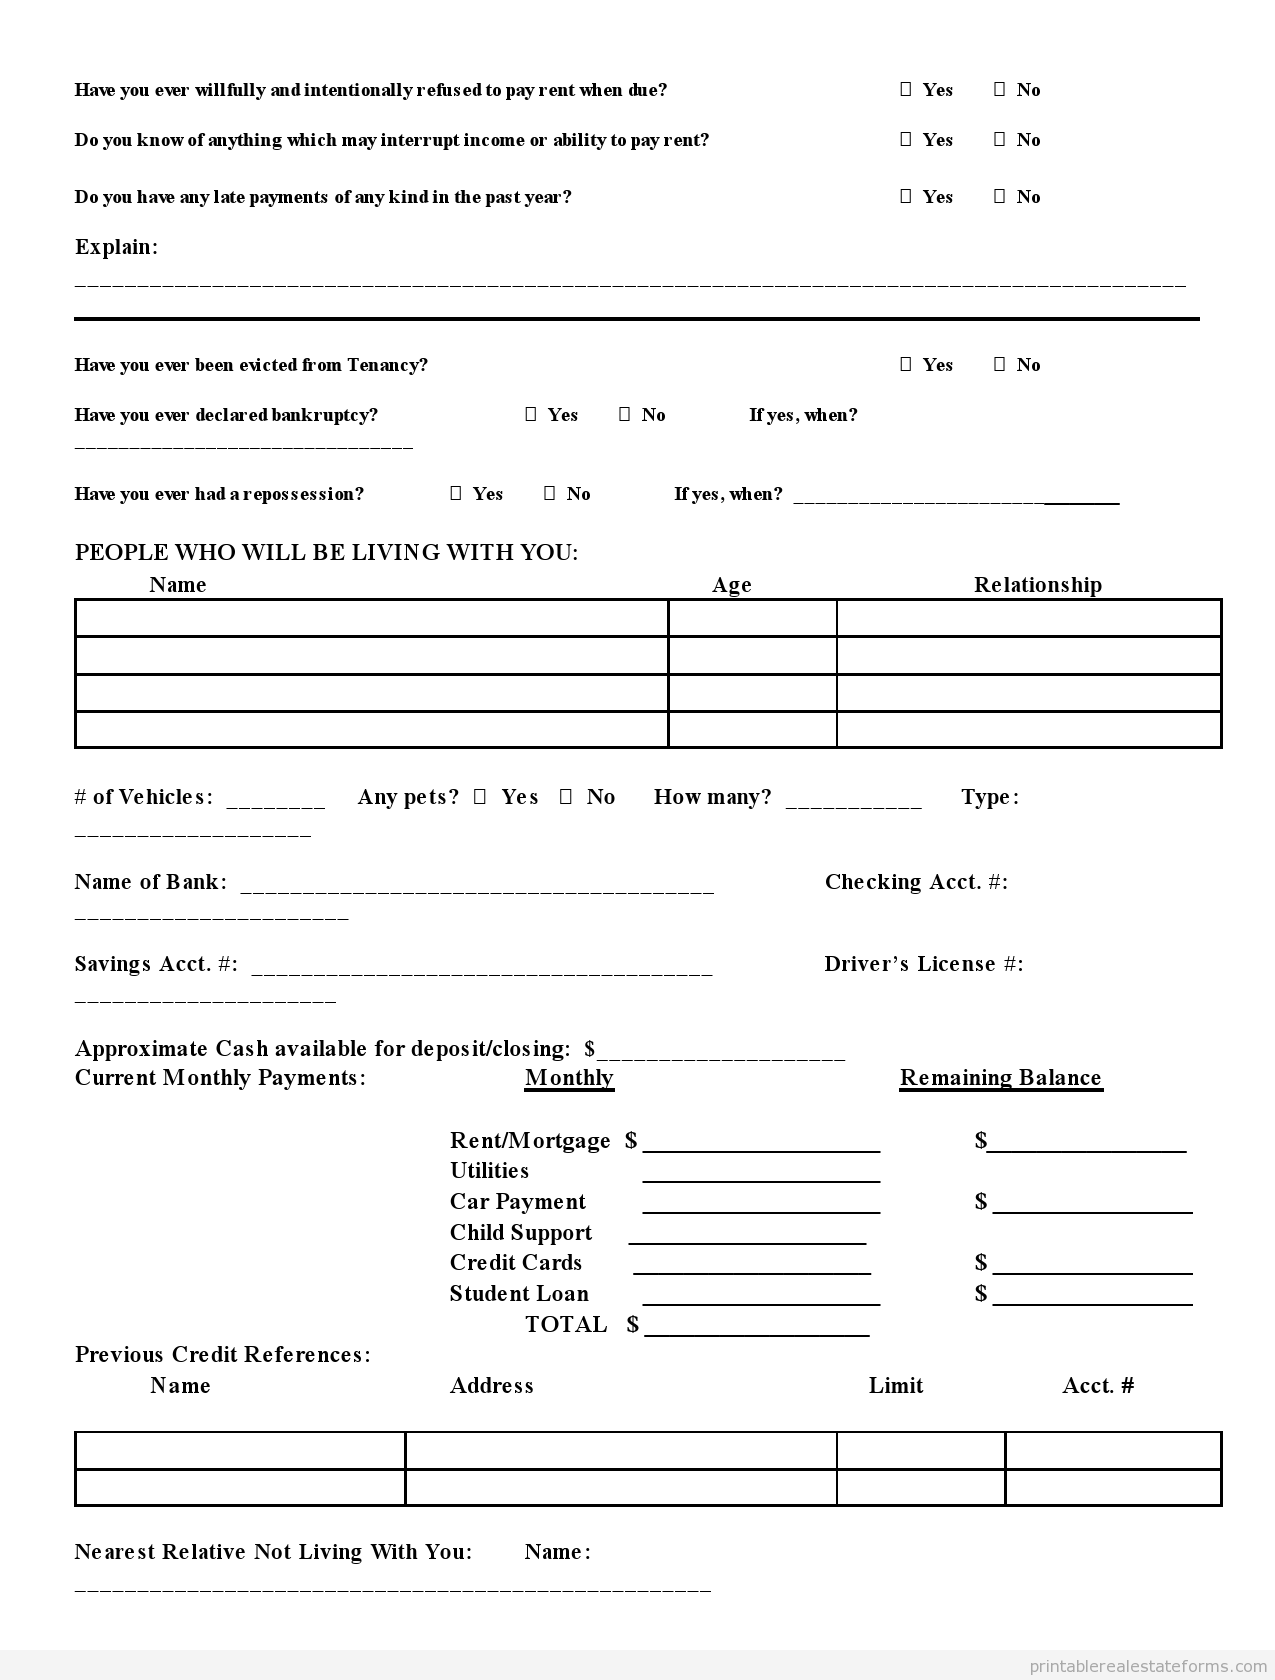 Sample Printable Preliminary Credit Application Form  Sample Real